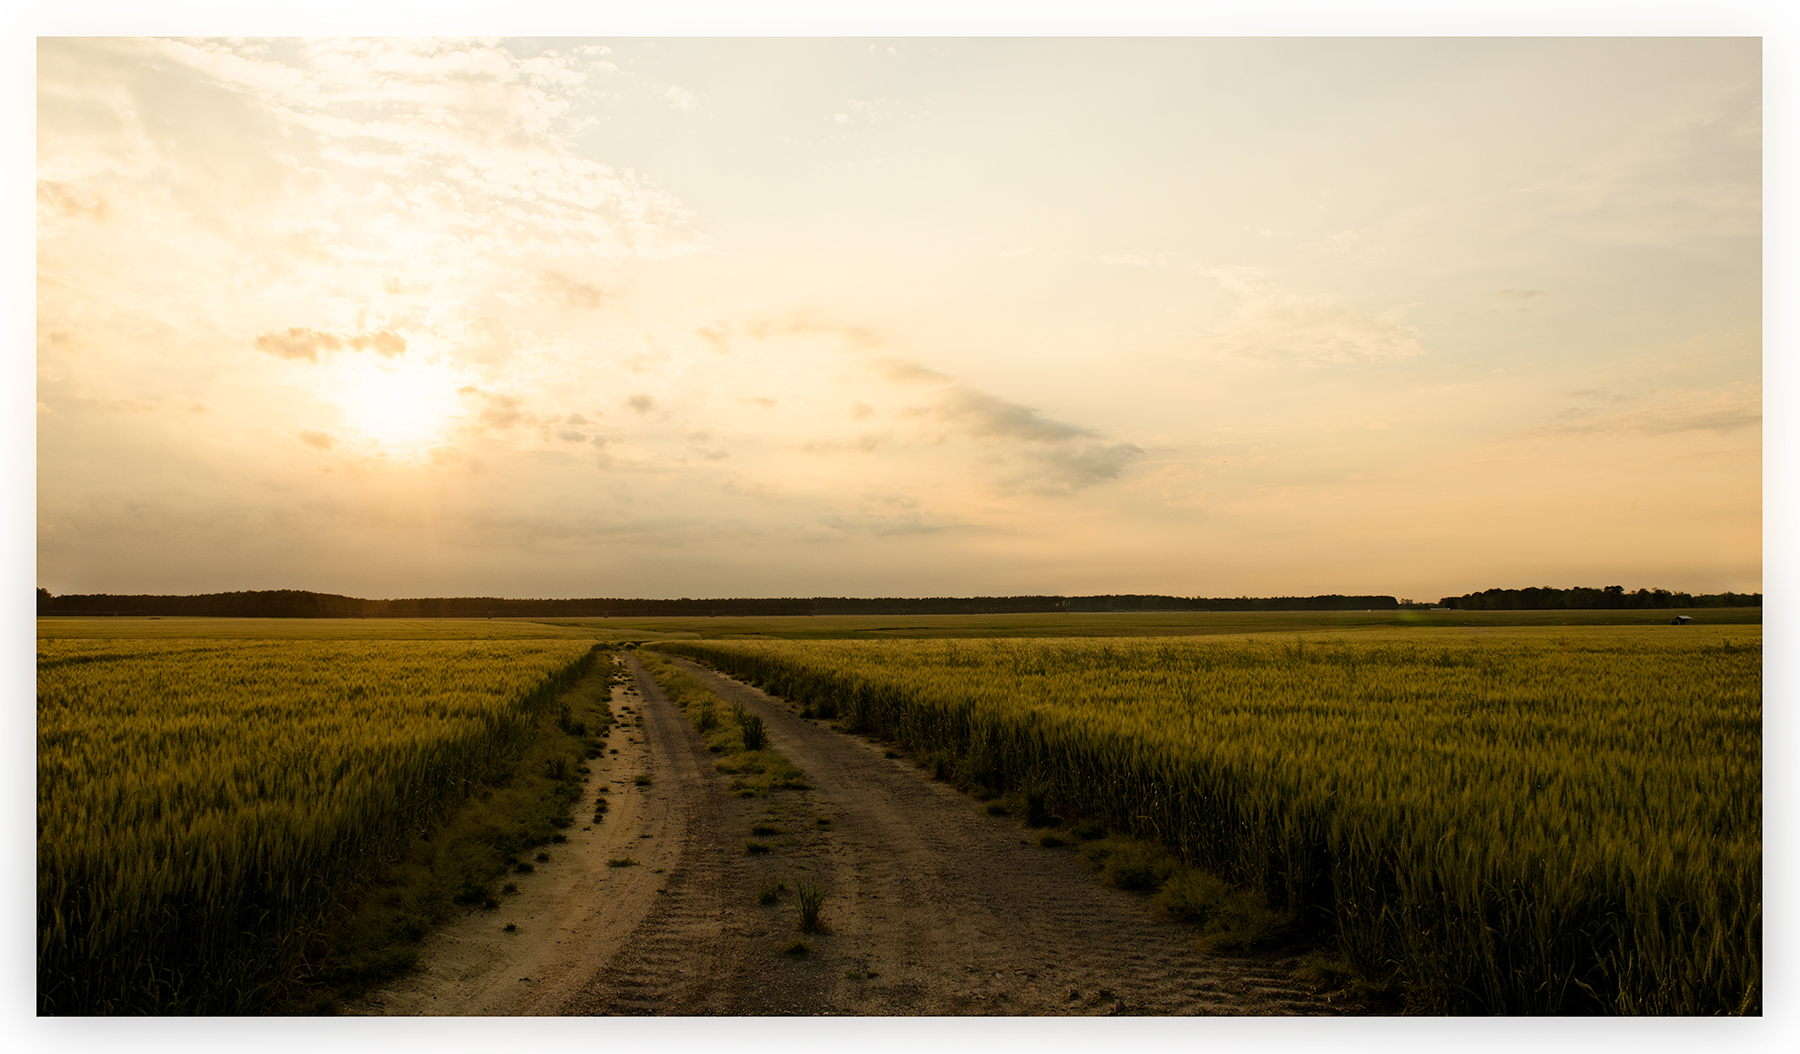 Dirt road, eastern North Carolina